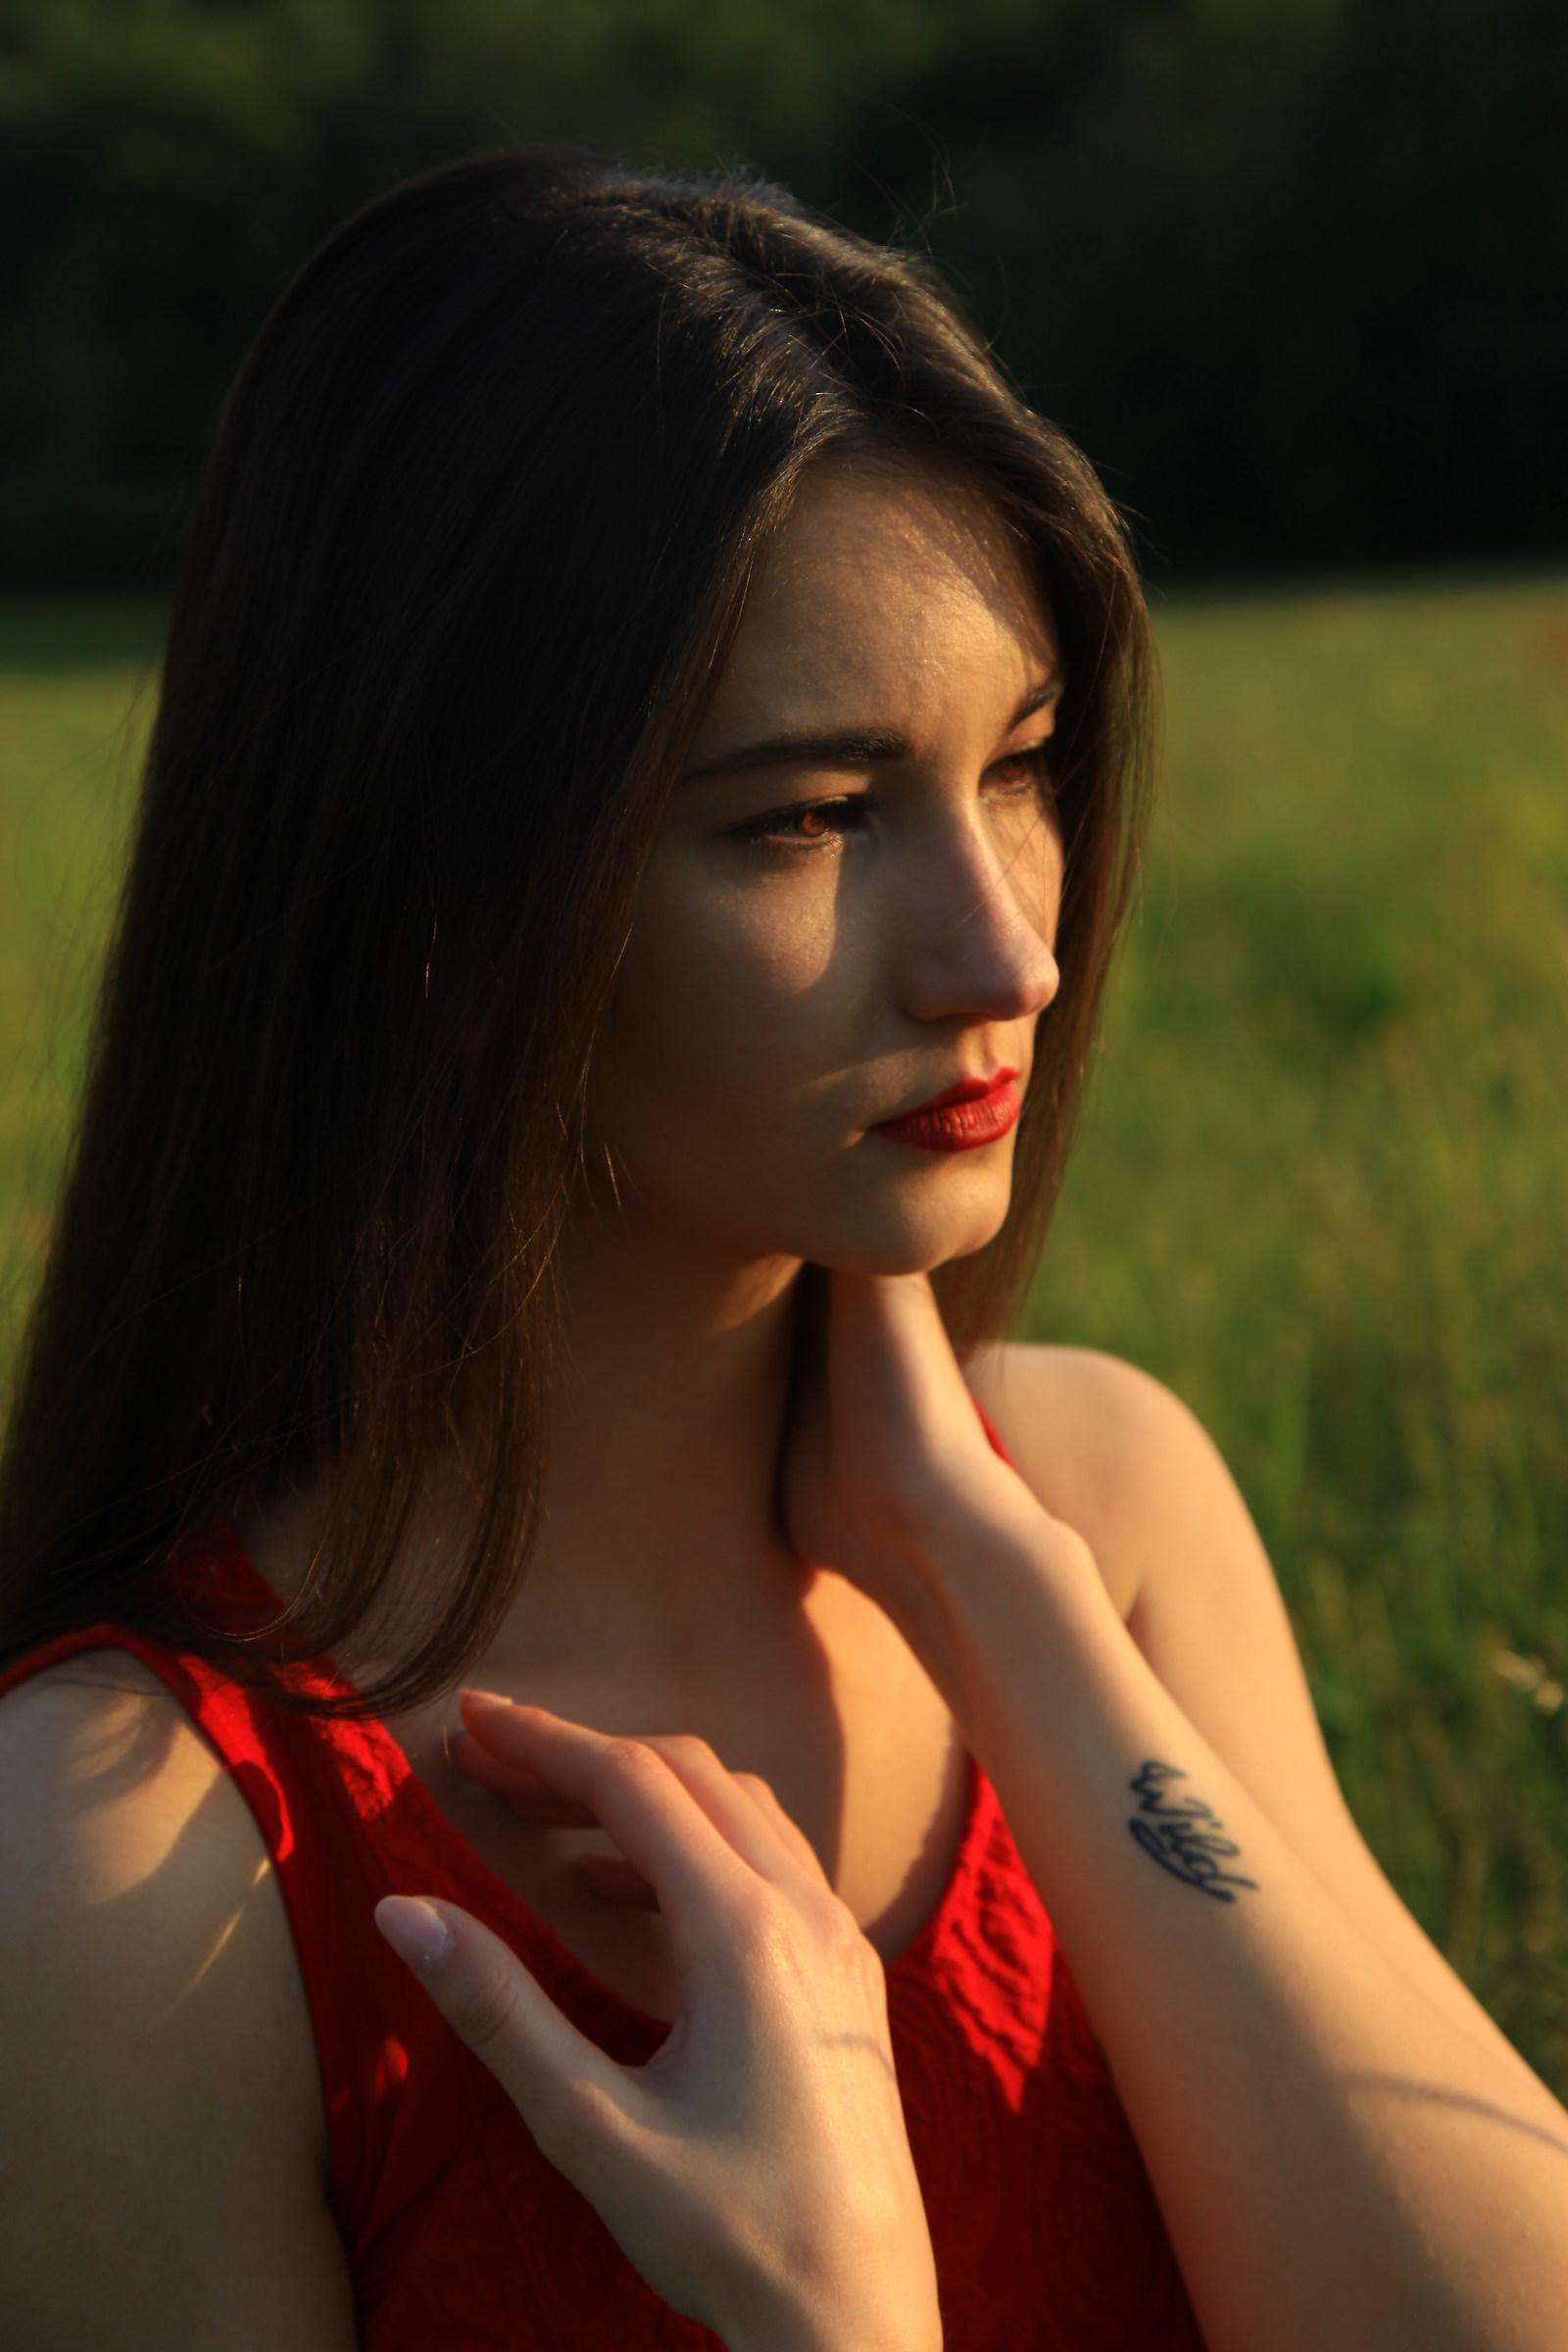 Red lipstick....